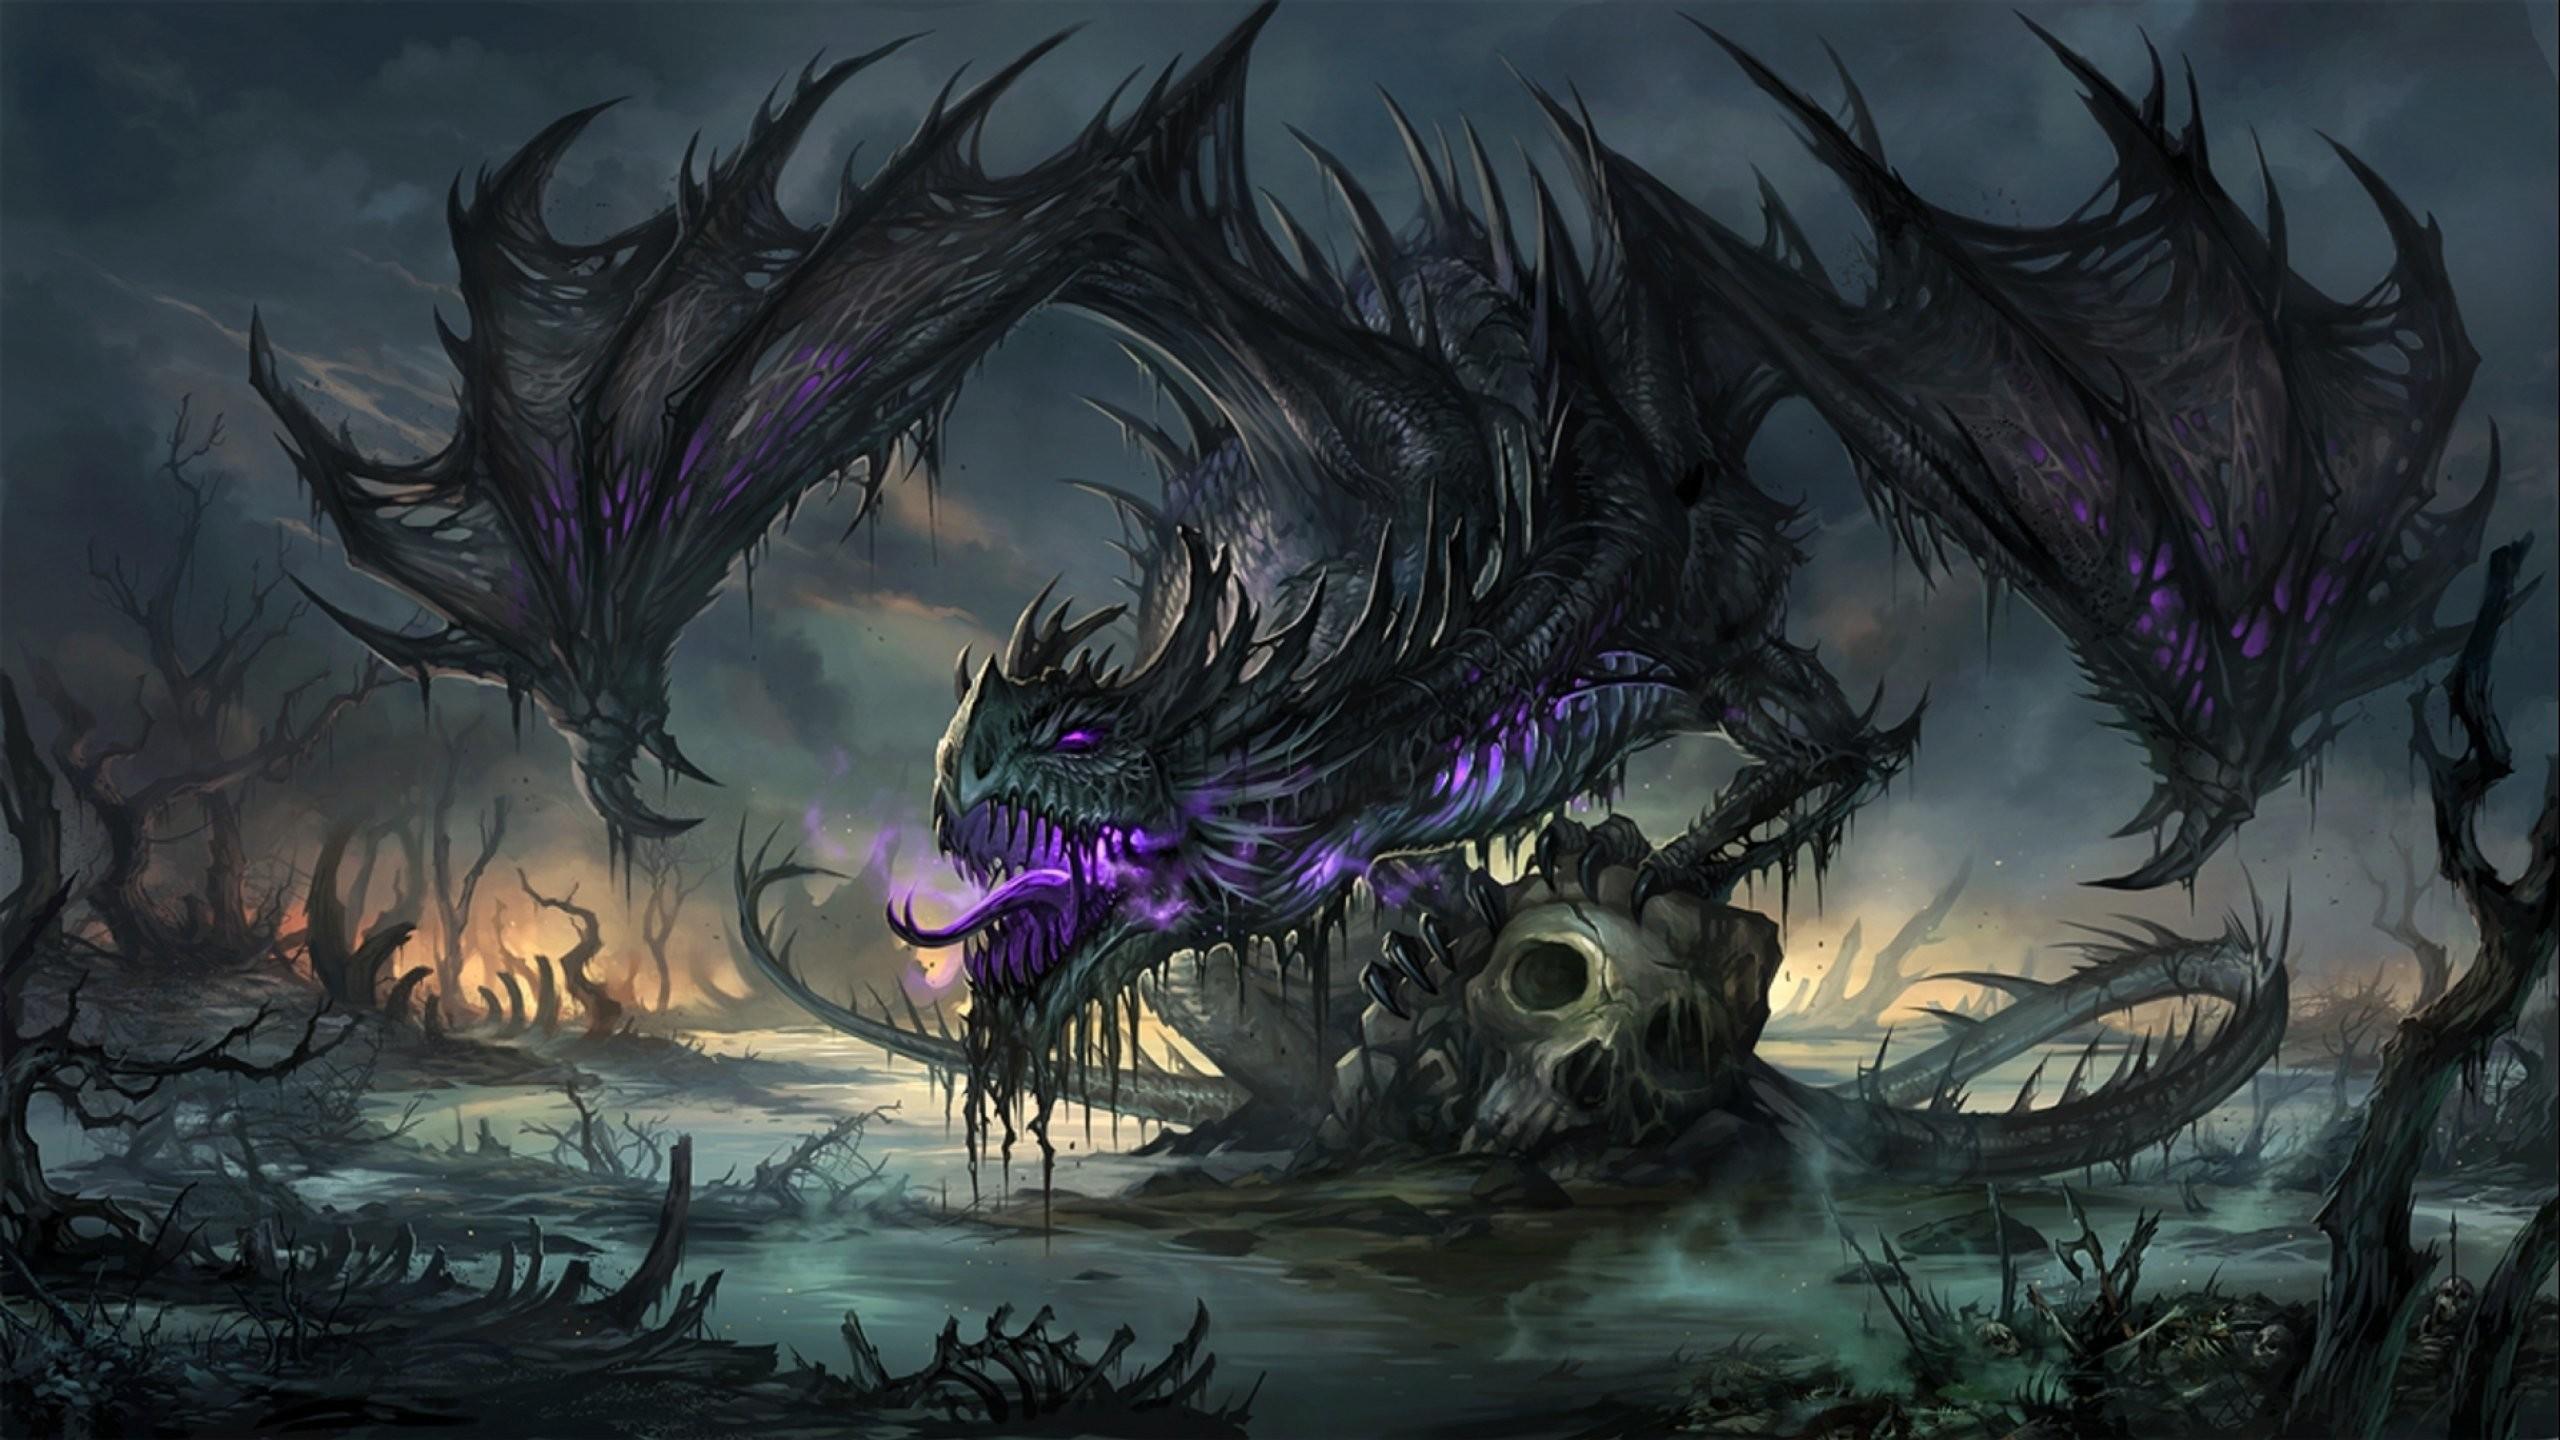 Dragon fantasy artwork art dragons wallpaper     650286    WallpaperUP